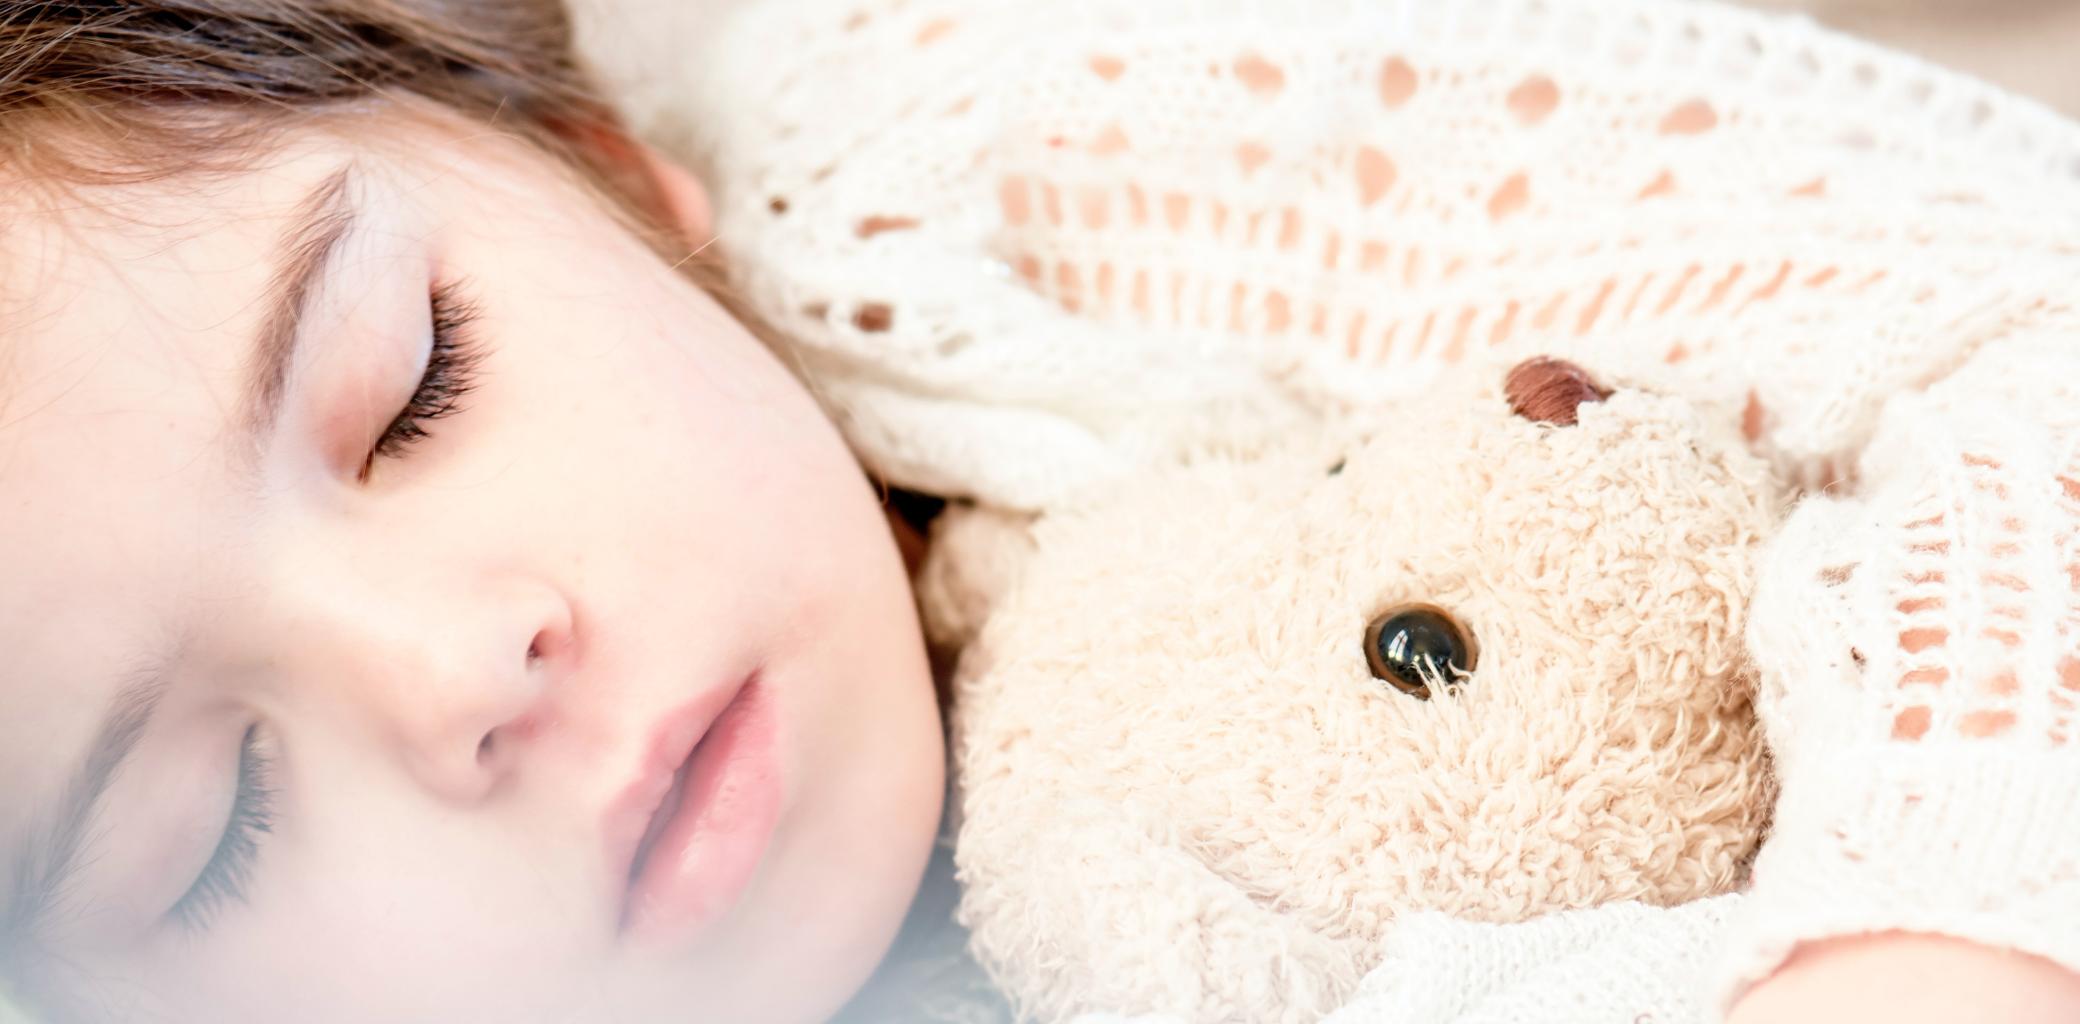 Enseñarles a dormir solos: 10 tips que te ayudarán